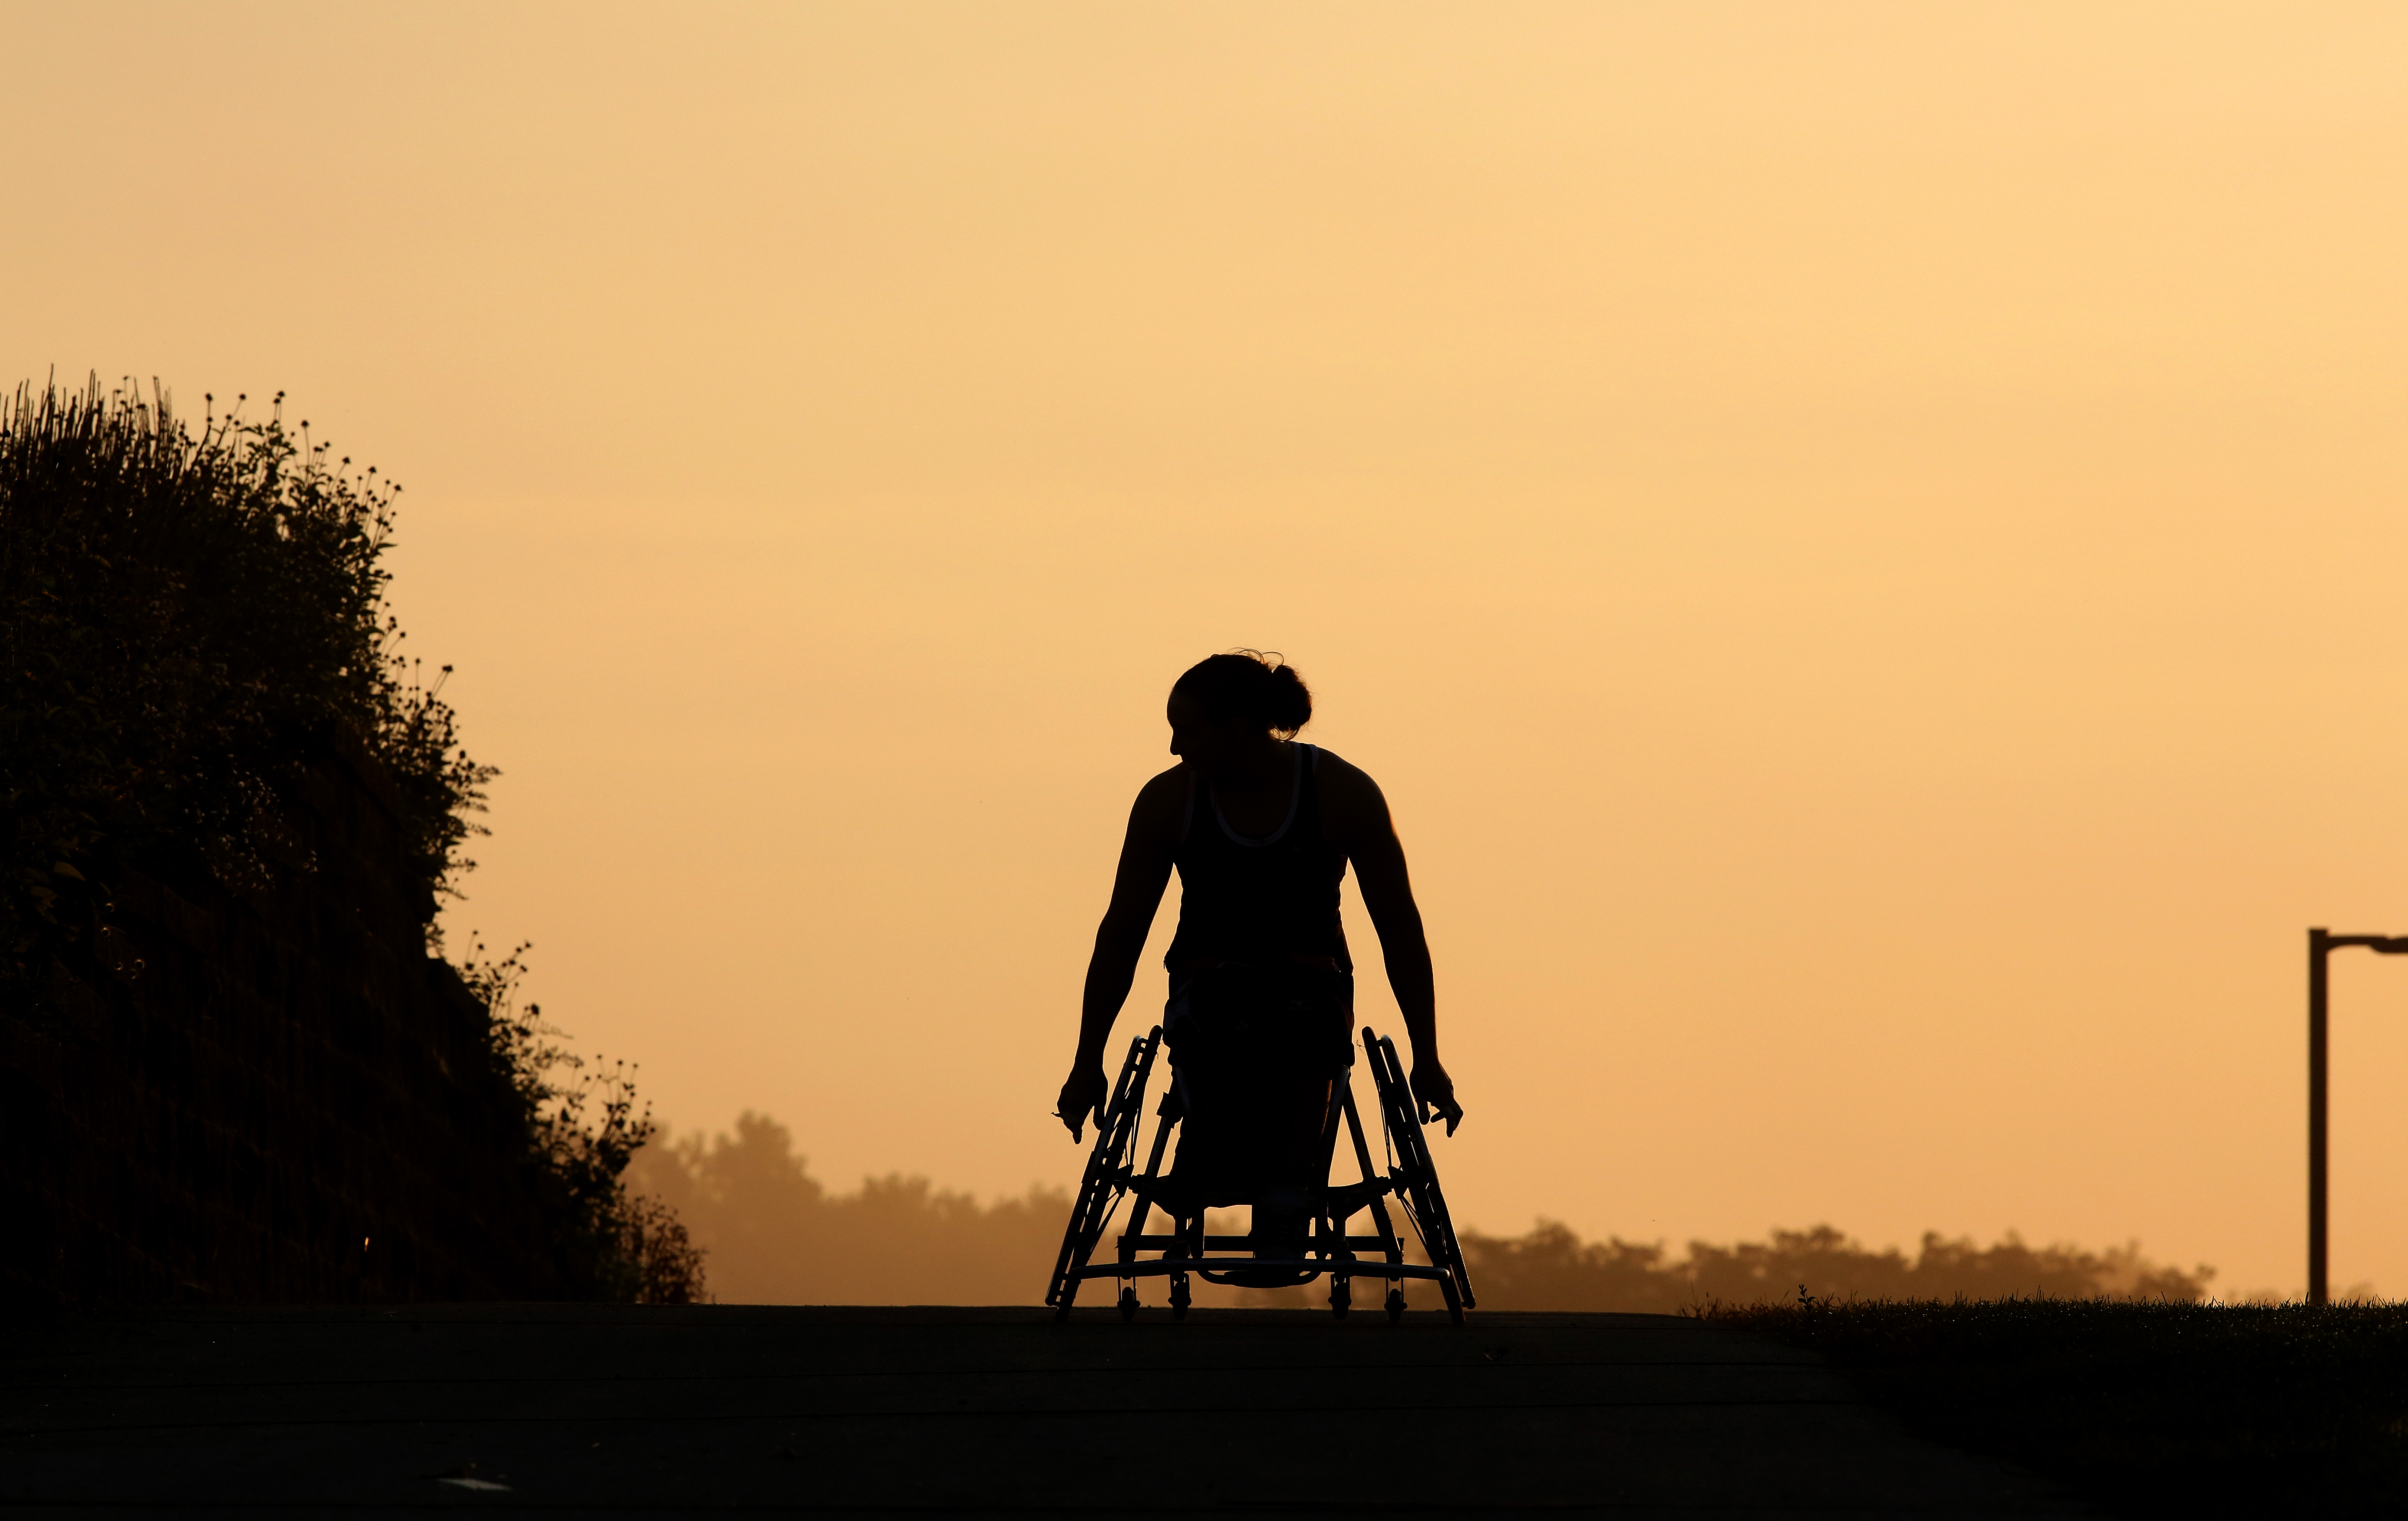 1412112233 091914cs wheelchair women strength conditioning team 1366